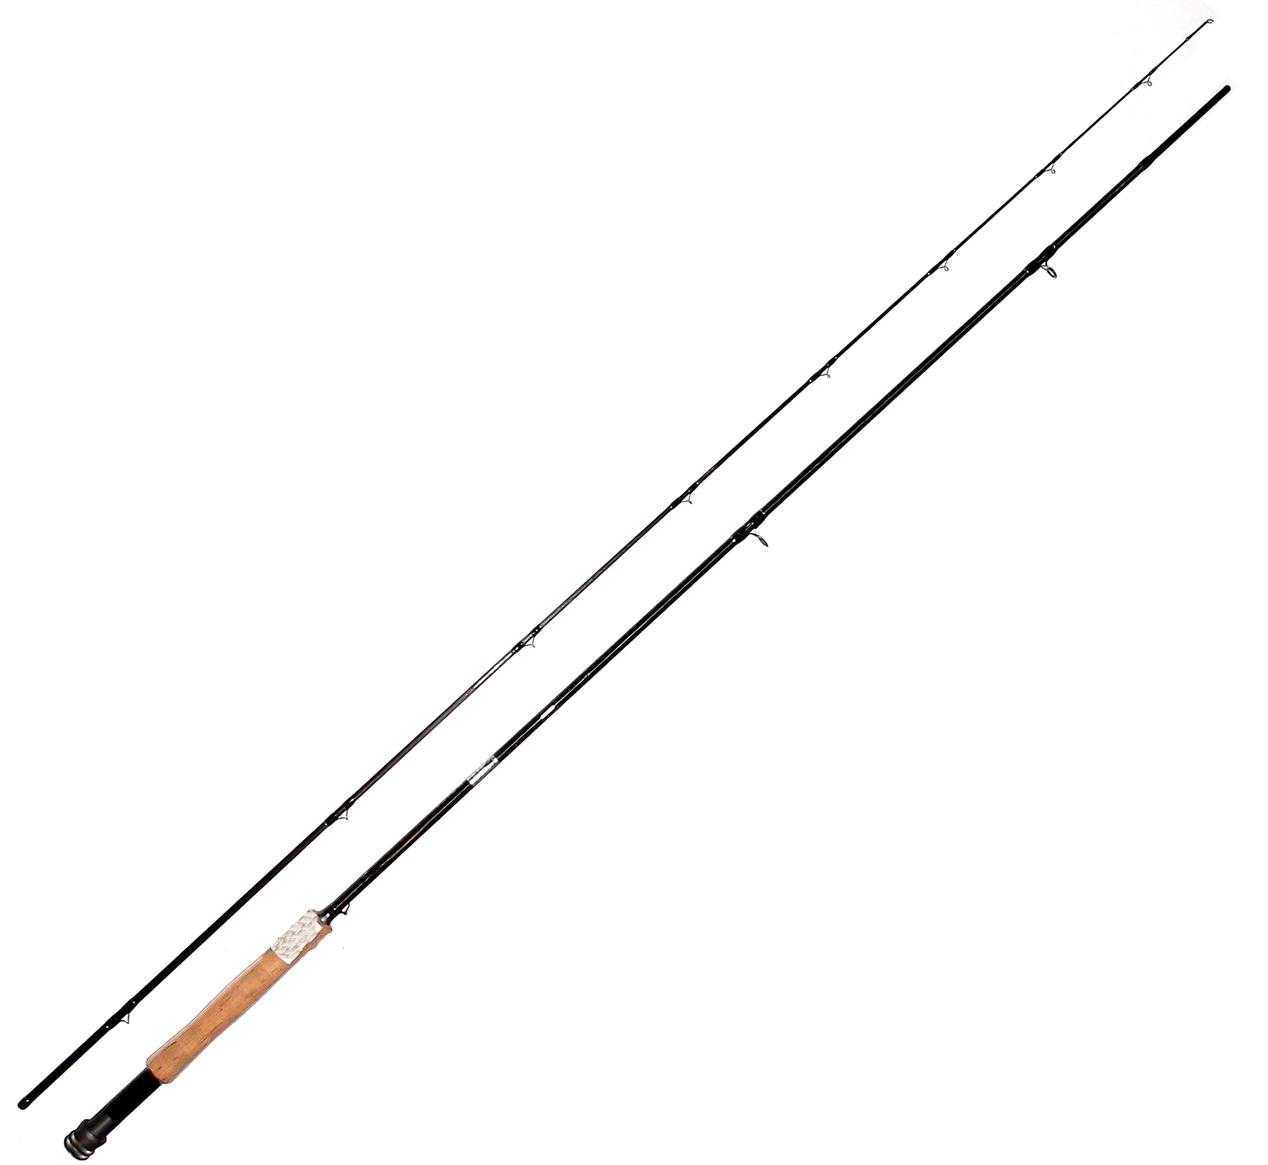 Удилище ET нахлыст Blade Fly 2.4 м 8' № 3/4 Carbon карбон IM-12